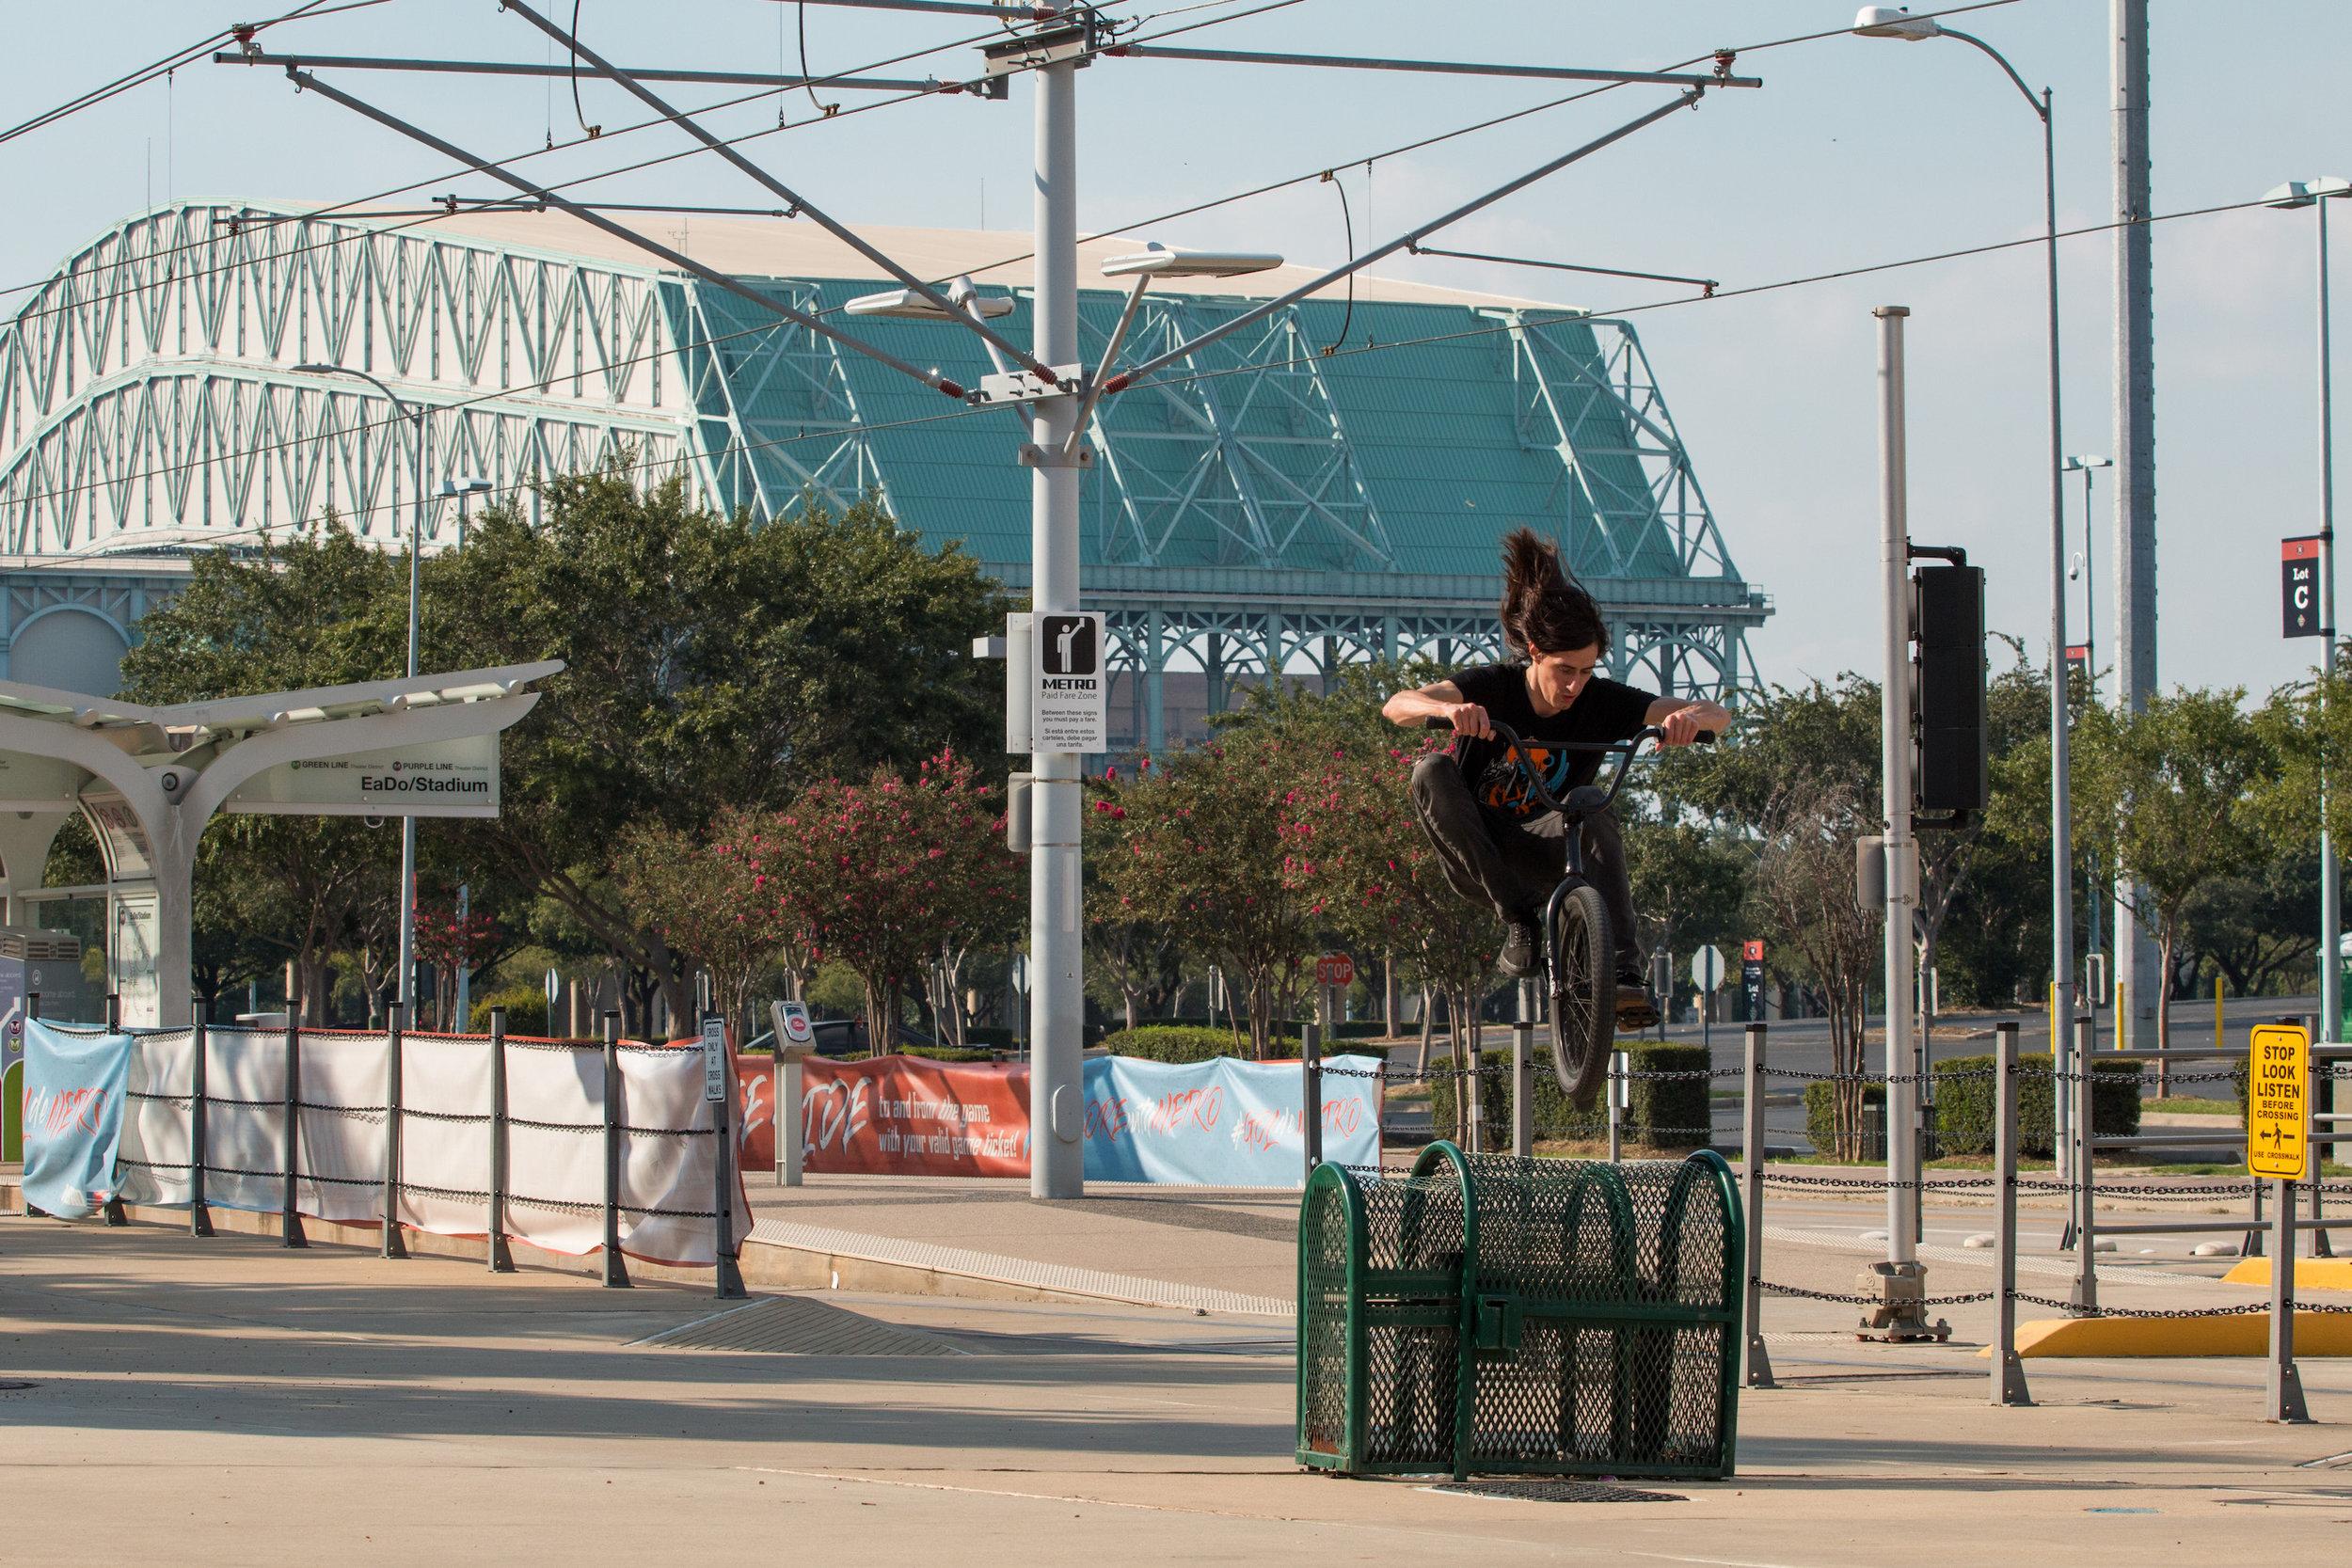 20170910 sunday street ride Chad McClain_half res_1.jpg